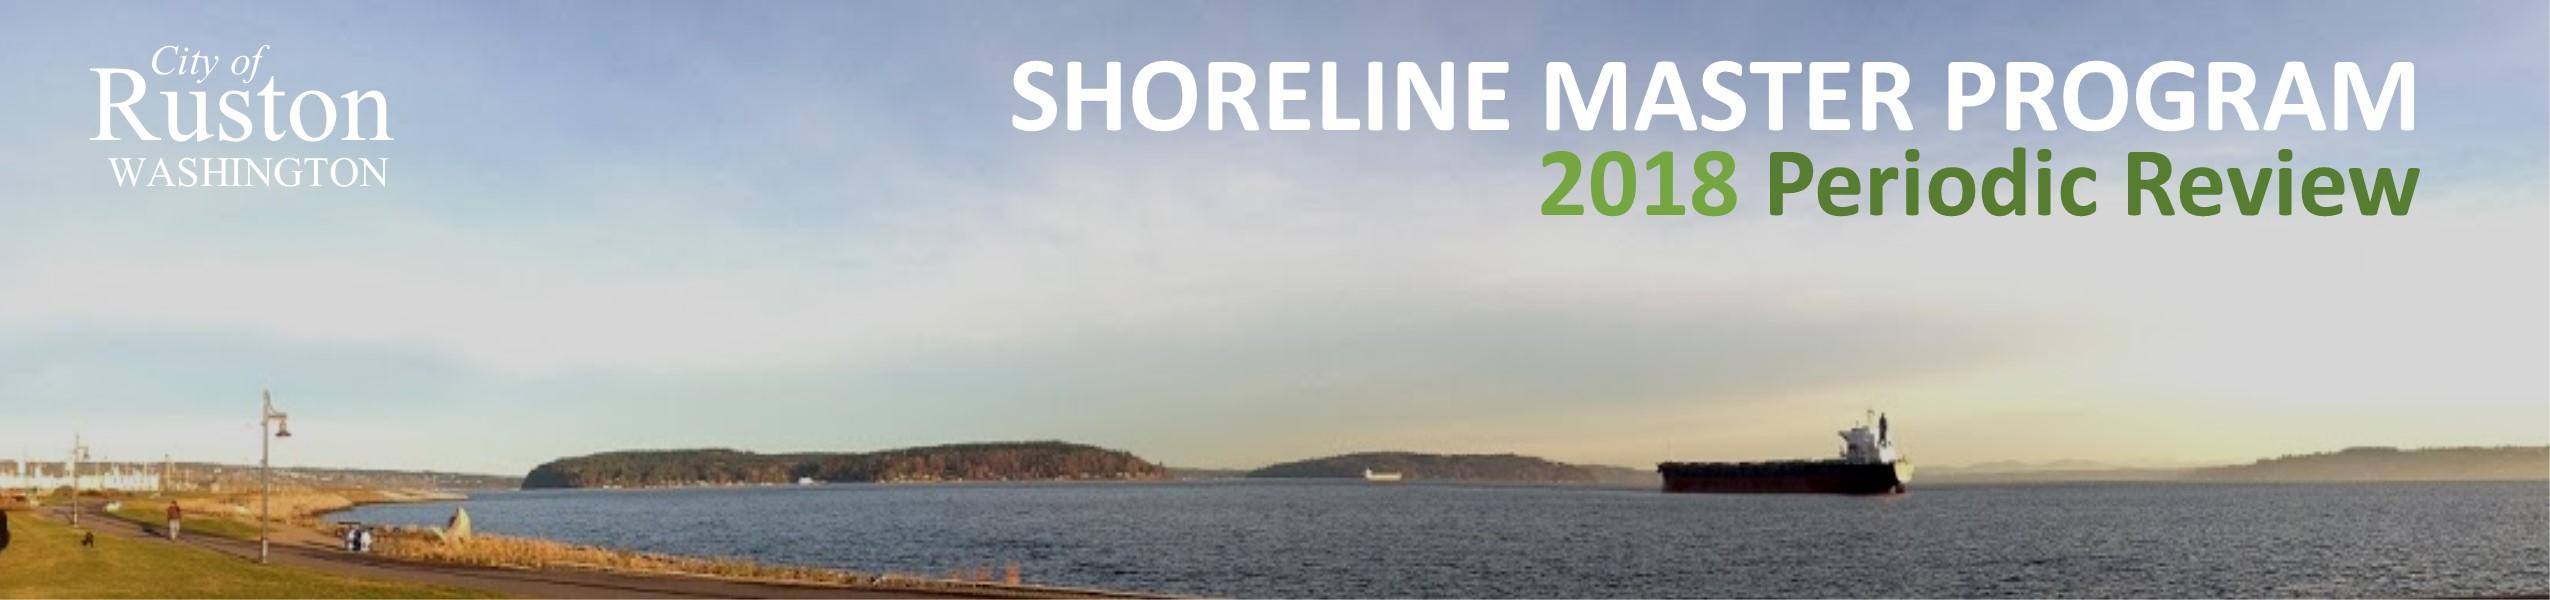 shoreline master program 2018